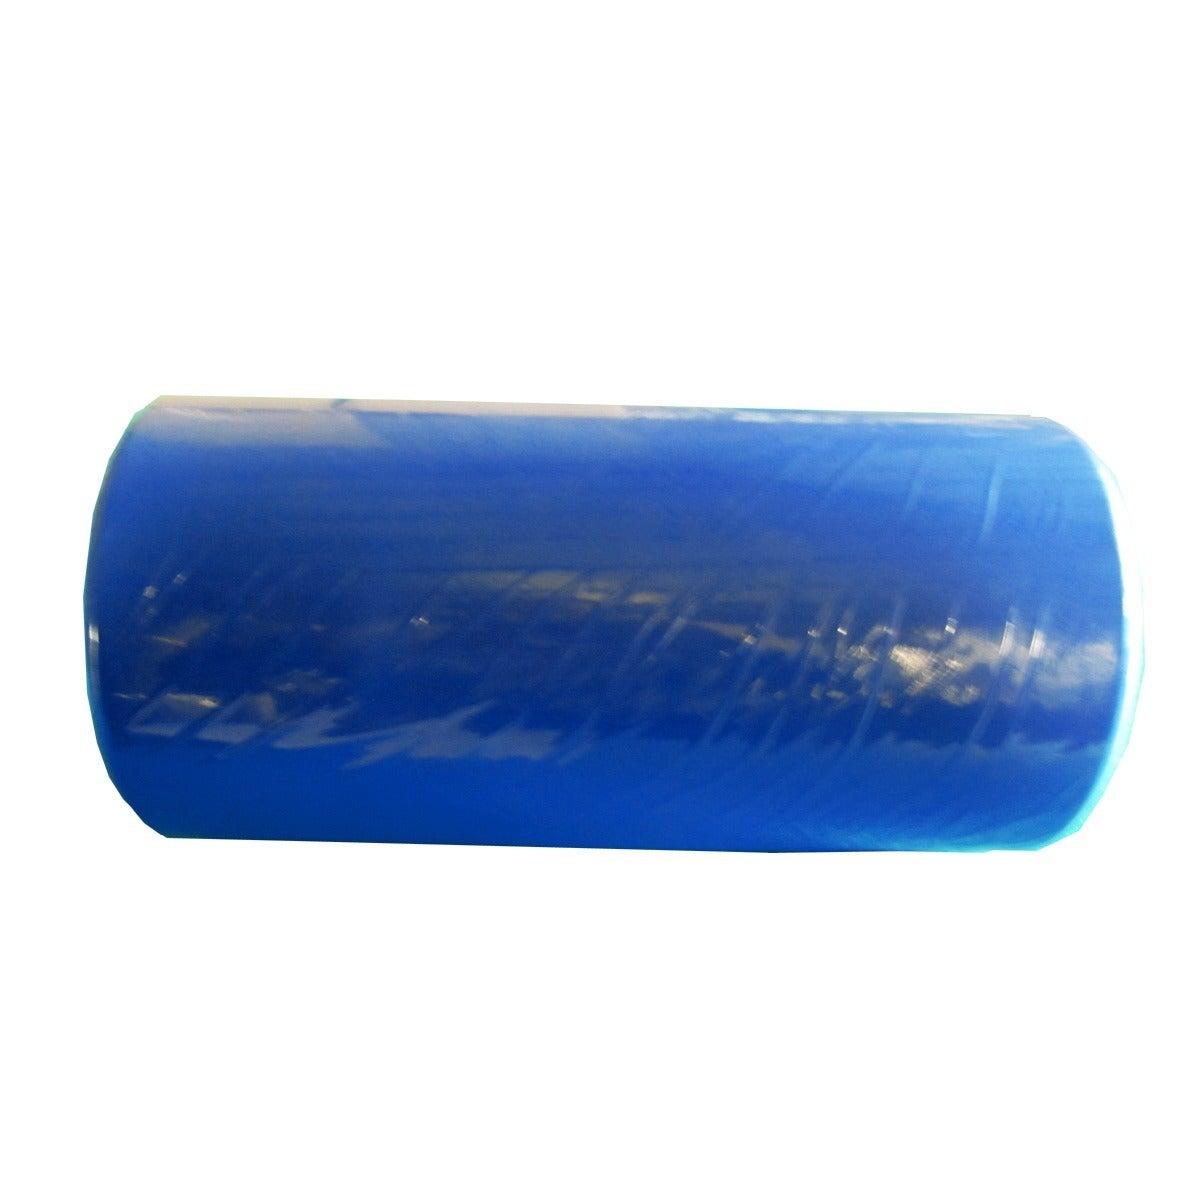 Overstock.com ActionLine KY-79011A 12-inch High-density Pilates EVA Foam Roller